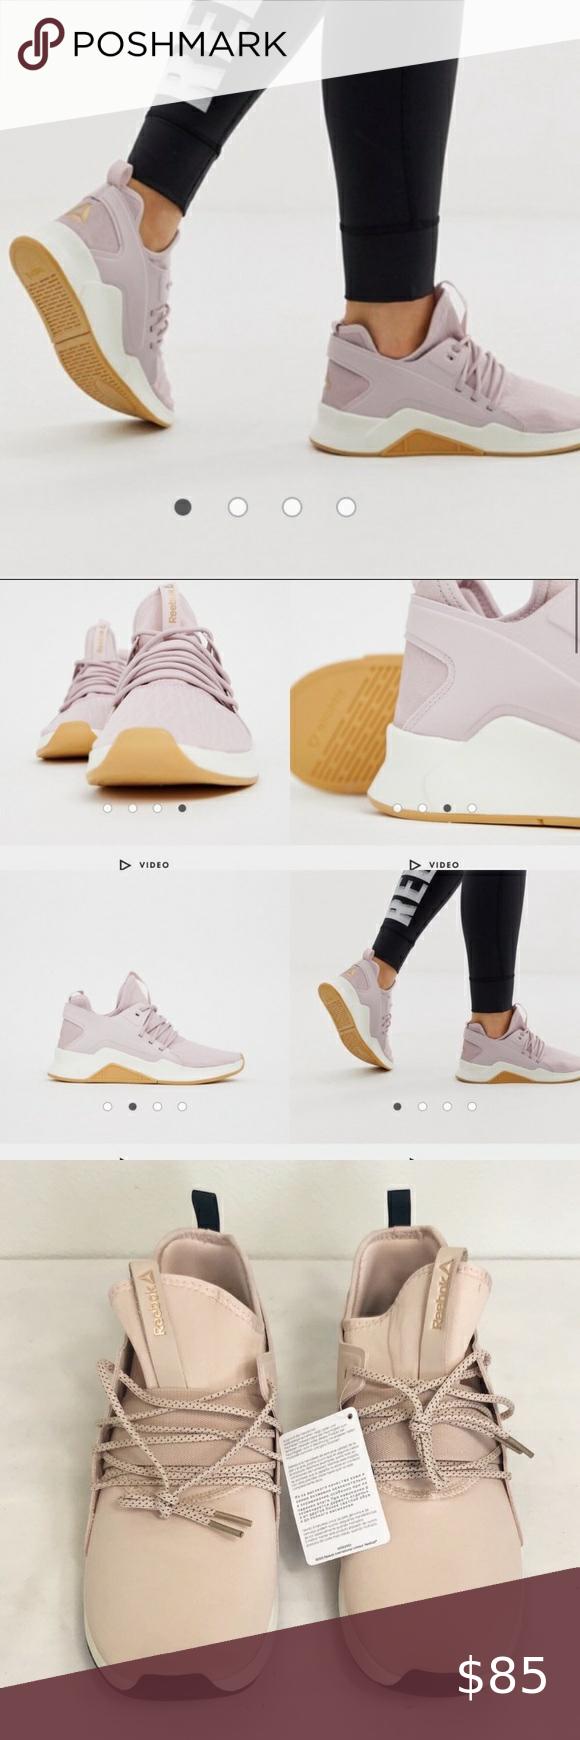 Reebok Guresu 2.0 Sneakers in Buff Chalk Sz 11 NIB Reebok Guresu 2.0 Sneakers in... -  Reebok Guresu 2.0 Sneakers in Buff Chalk Sz 11 NIB Reebok Guresu 2.0 Sneakers in Buff / Black / Cha - #Buff #chalk #Exercise #guresu #meditation #NIB #reebok #sneakers #StudioWorkouts #YogaPoses